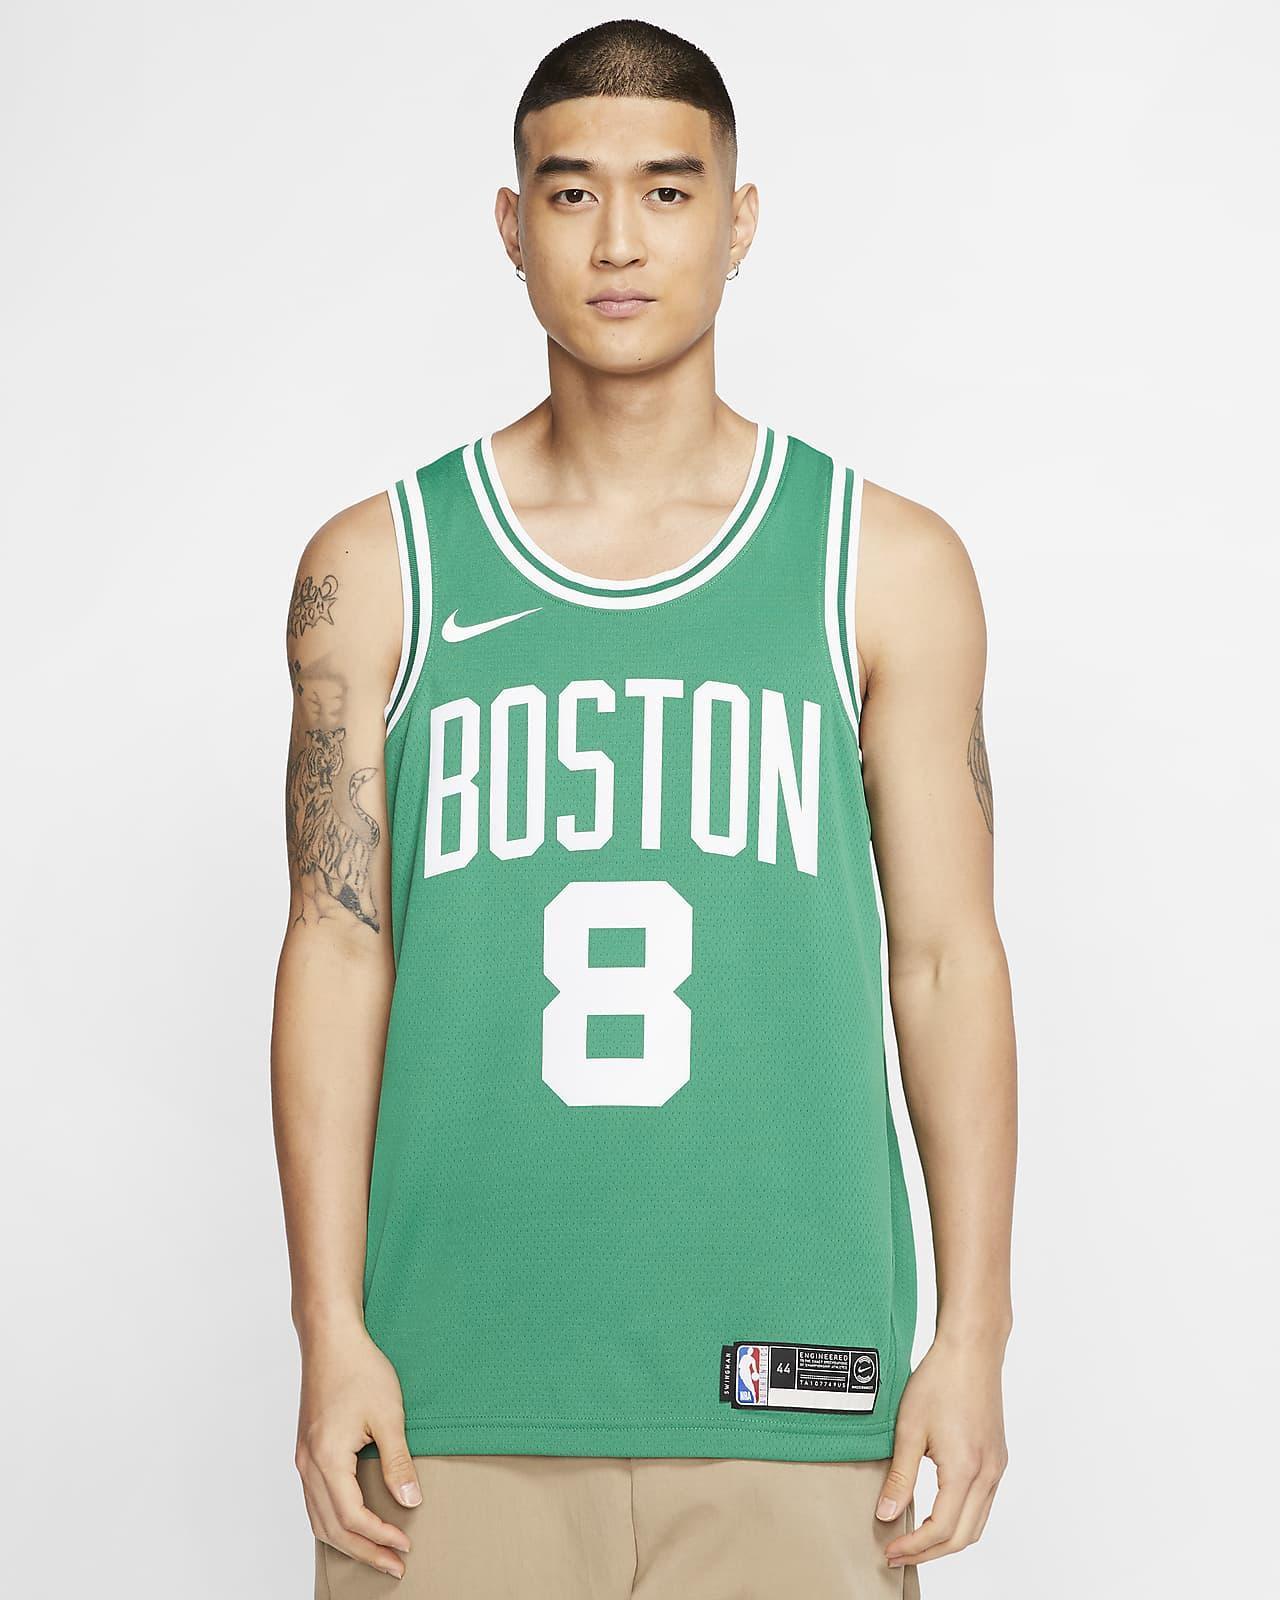 Camisola NBA da Nike Swingman Kemba Walker Celtics Icon Edition para homem